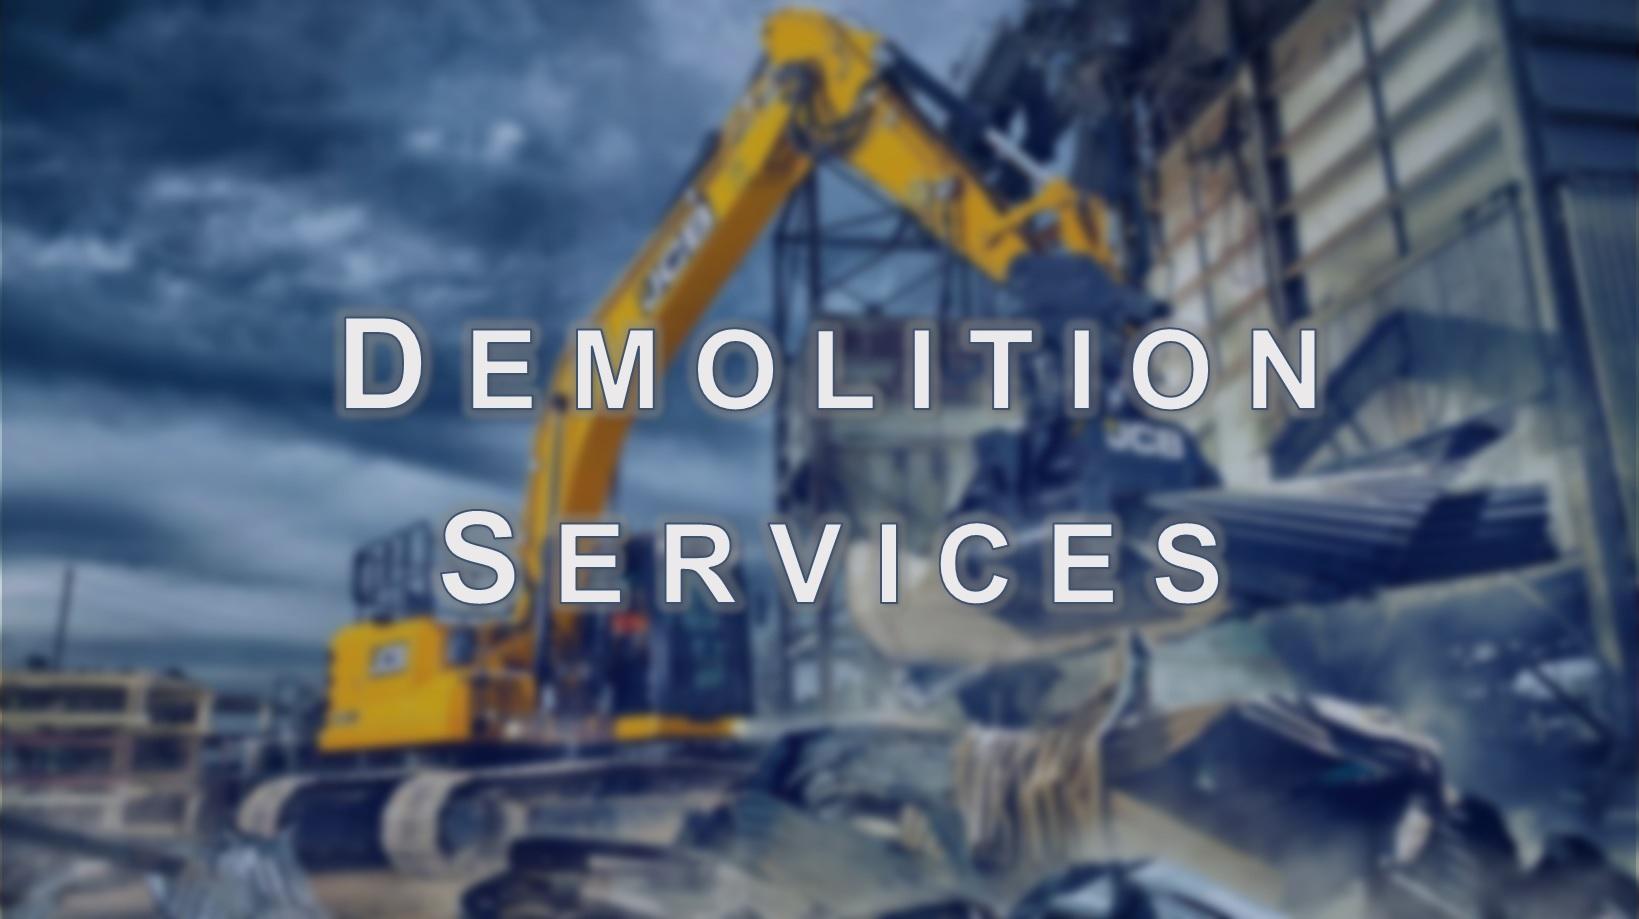 6. Demolition Services